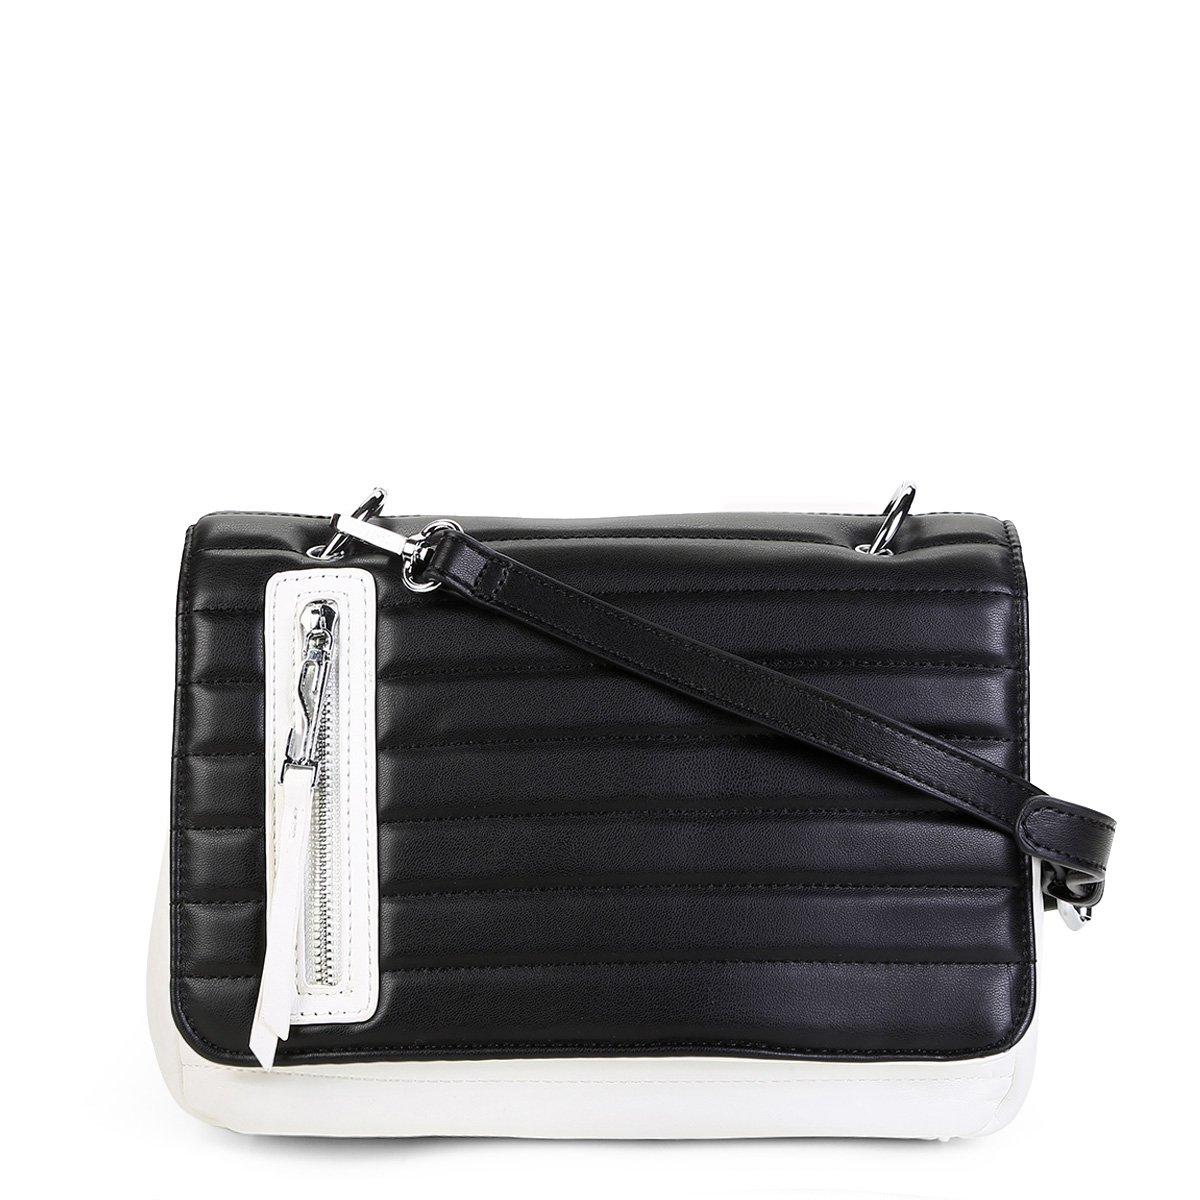 Bolsa Santa Lolla Flap Matelassê Feminina - Preto e Branco - Compre ... a61680ac902